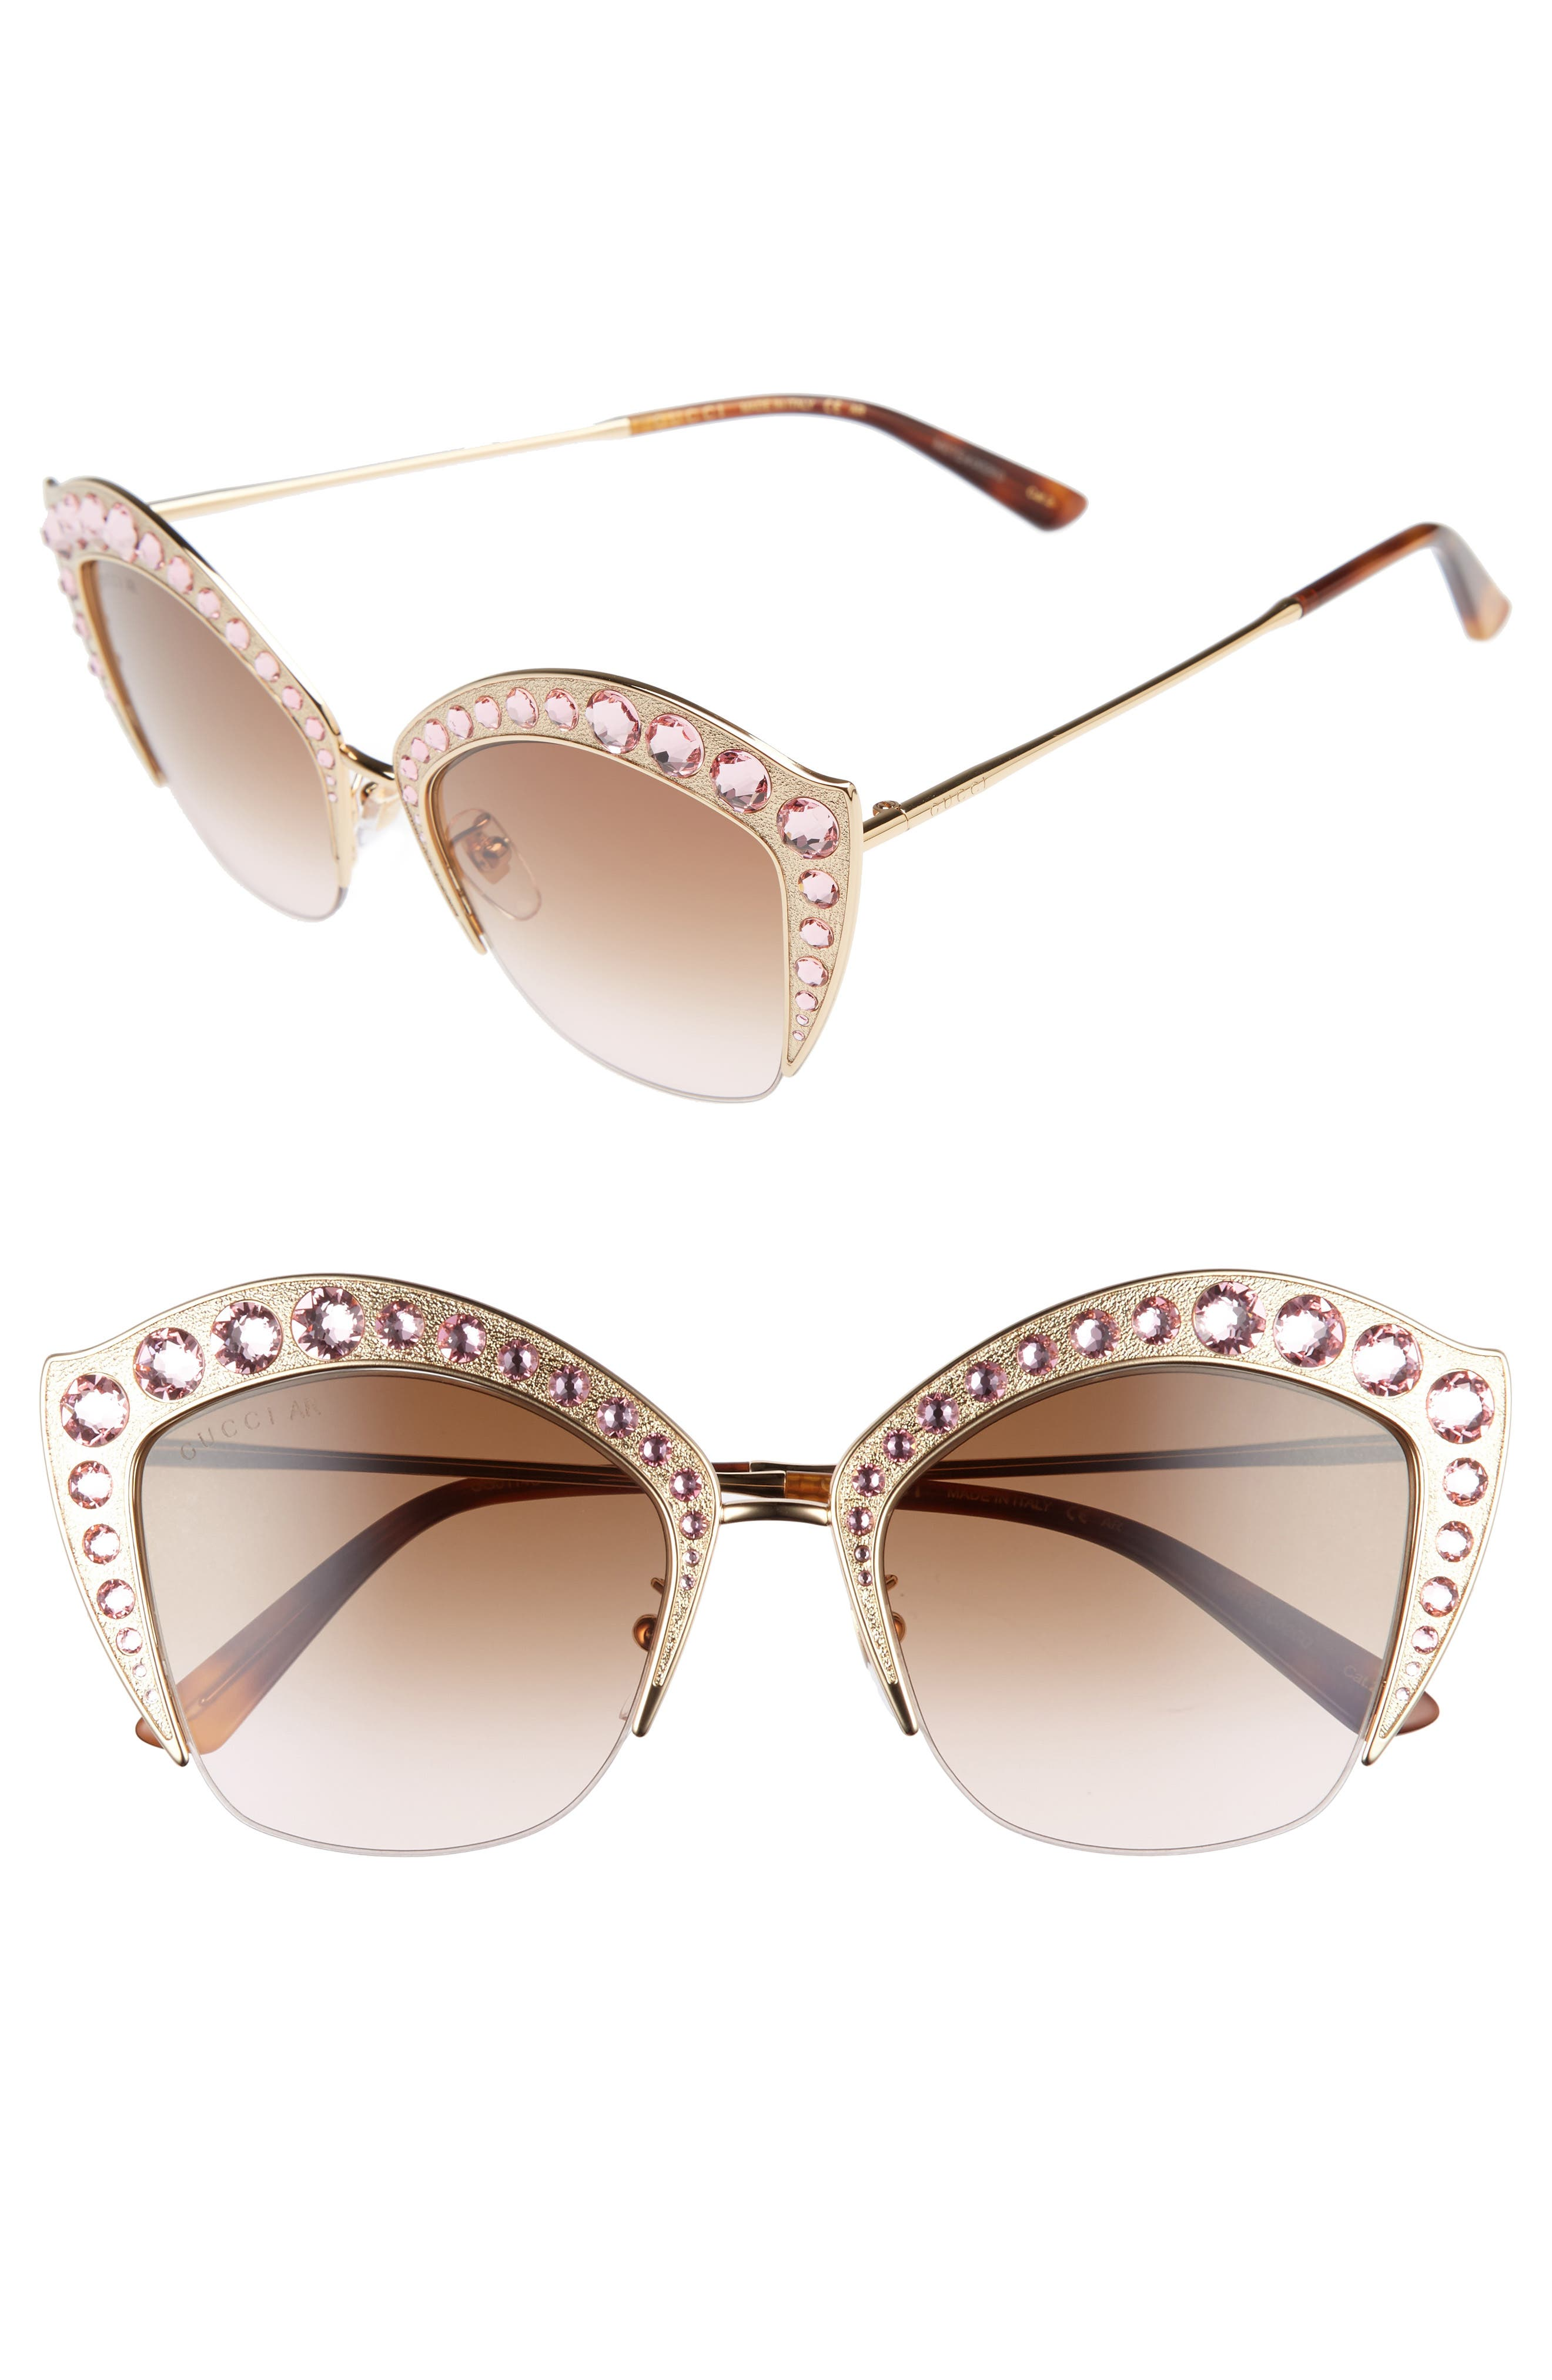 53mm Embellished Cat Eye Sunglasses,                             Main thumbnail 1, color,                             710